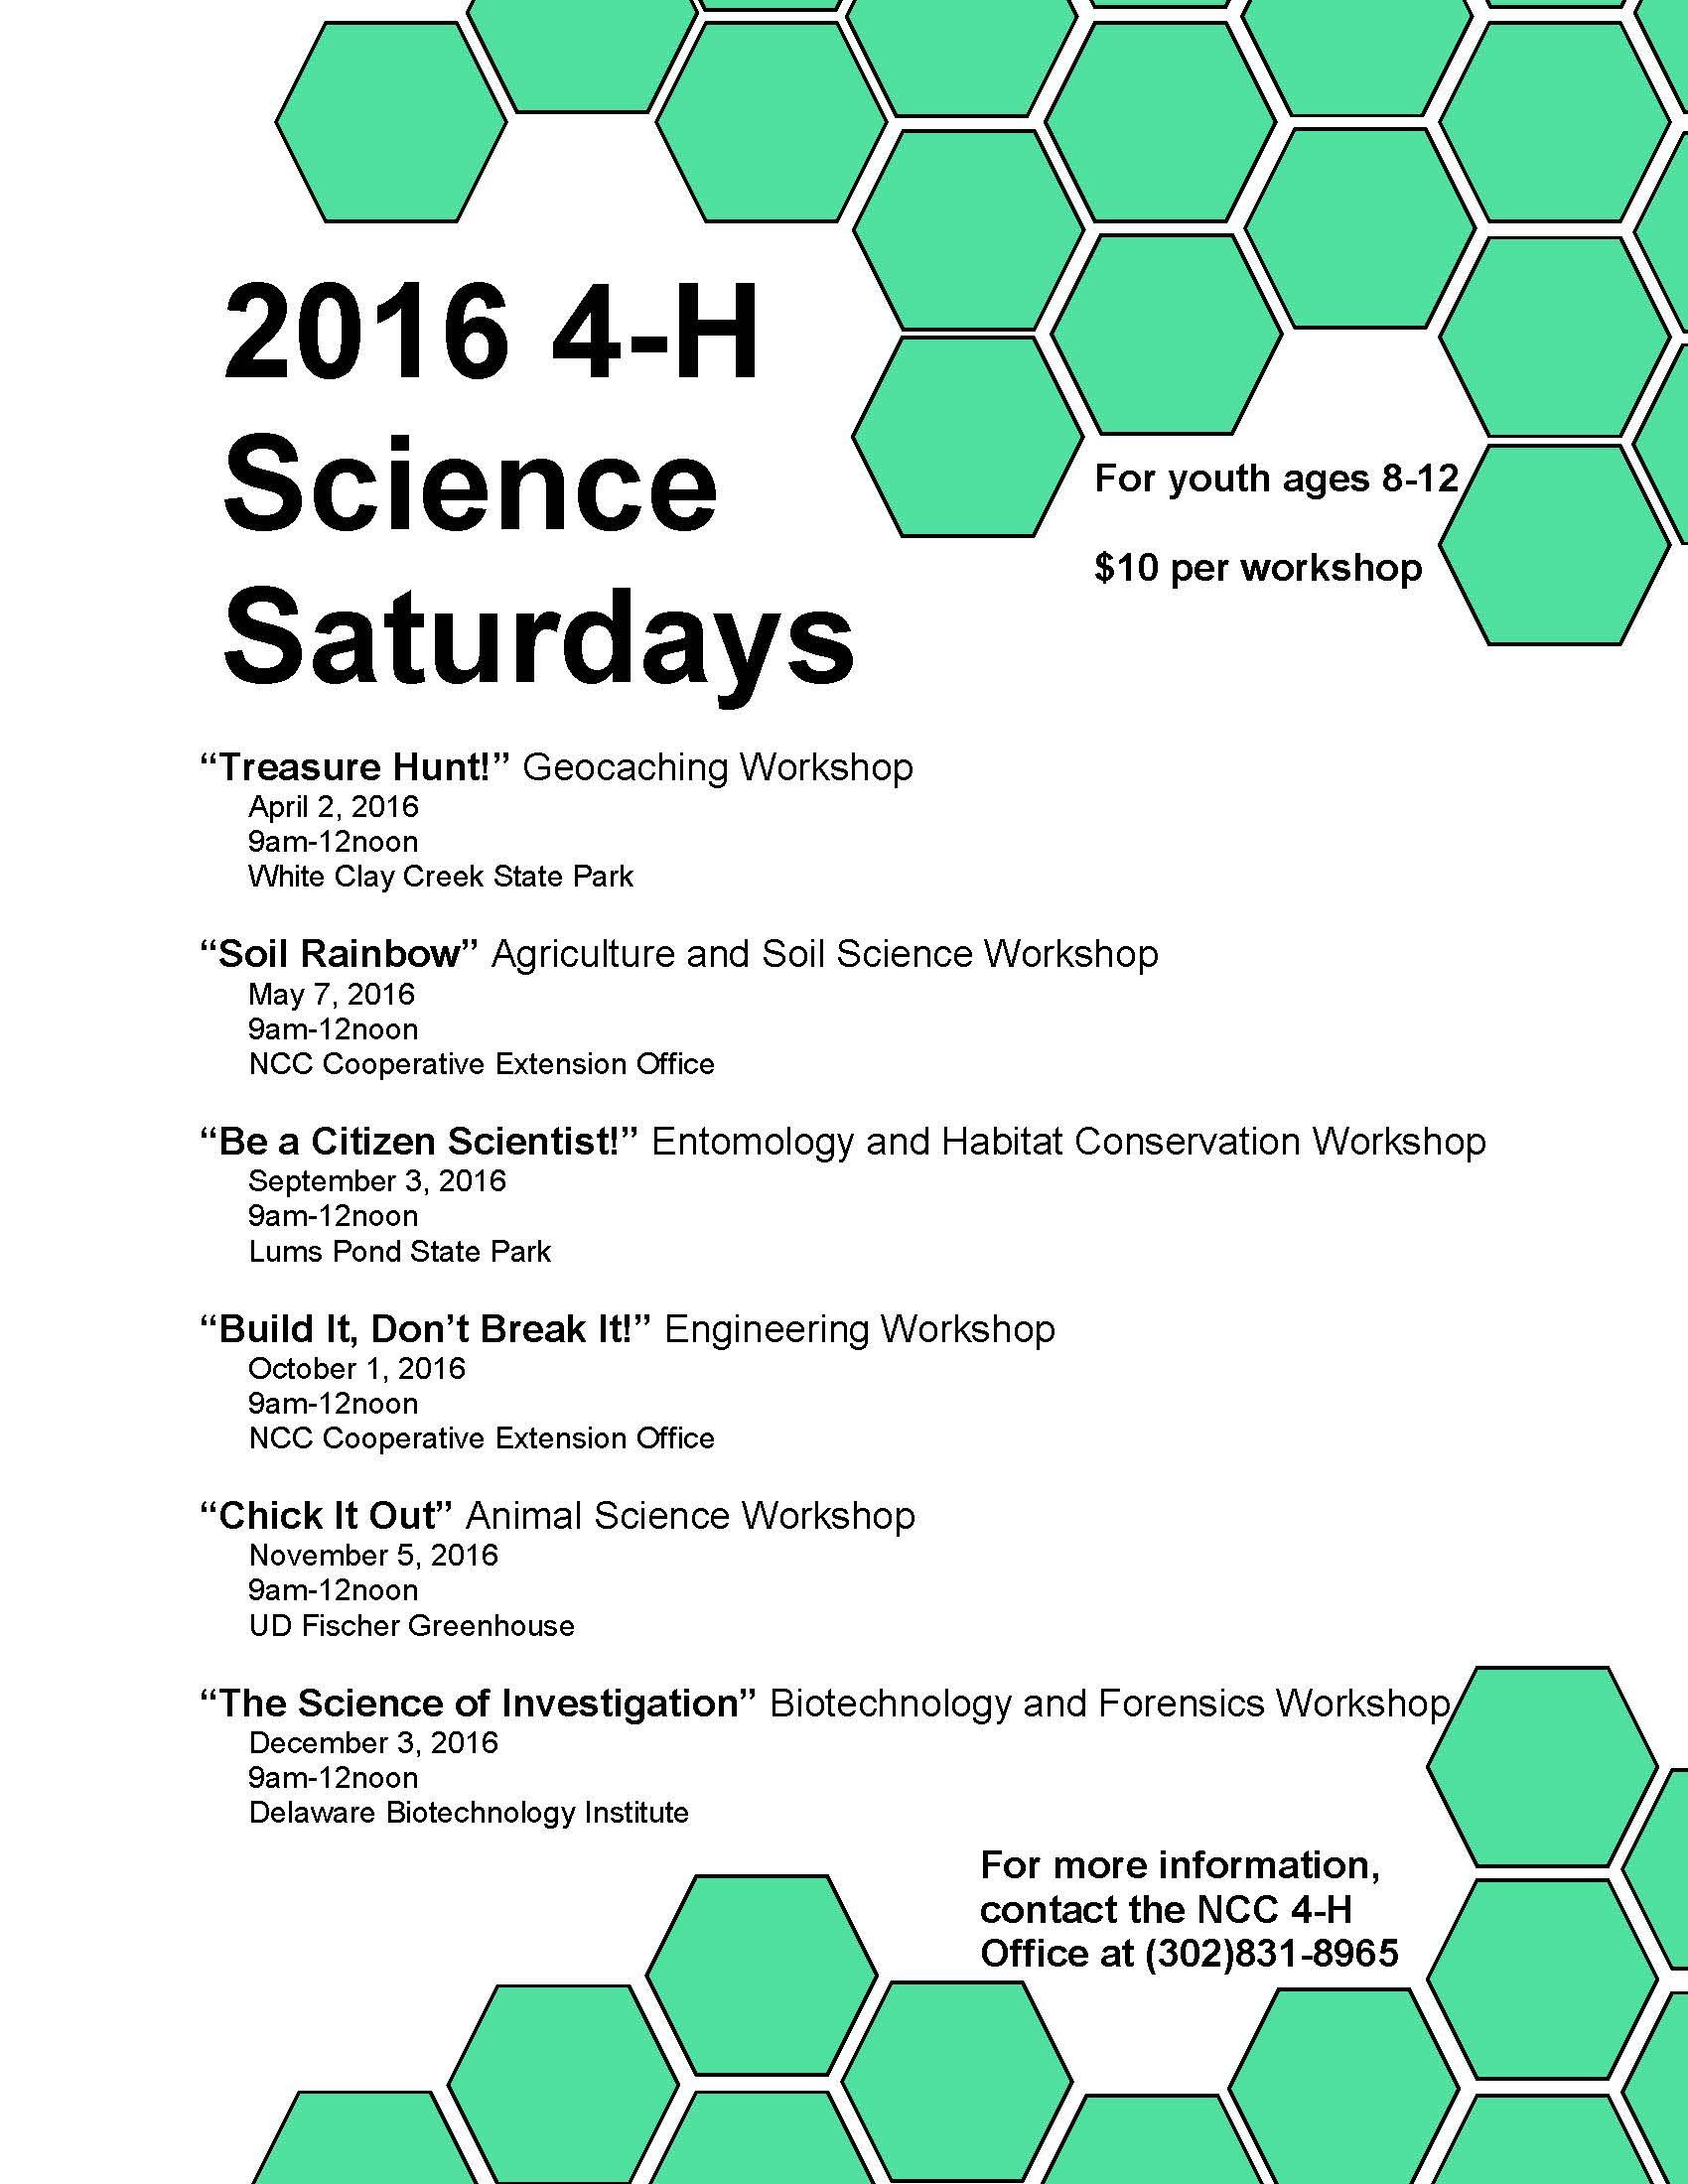 2016 4-H Science Saturdays Flyer